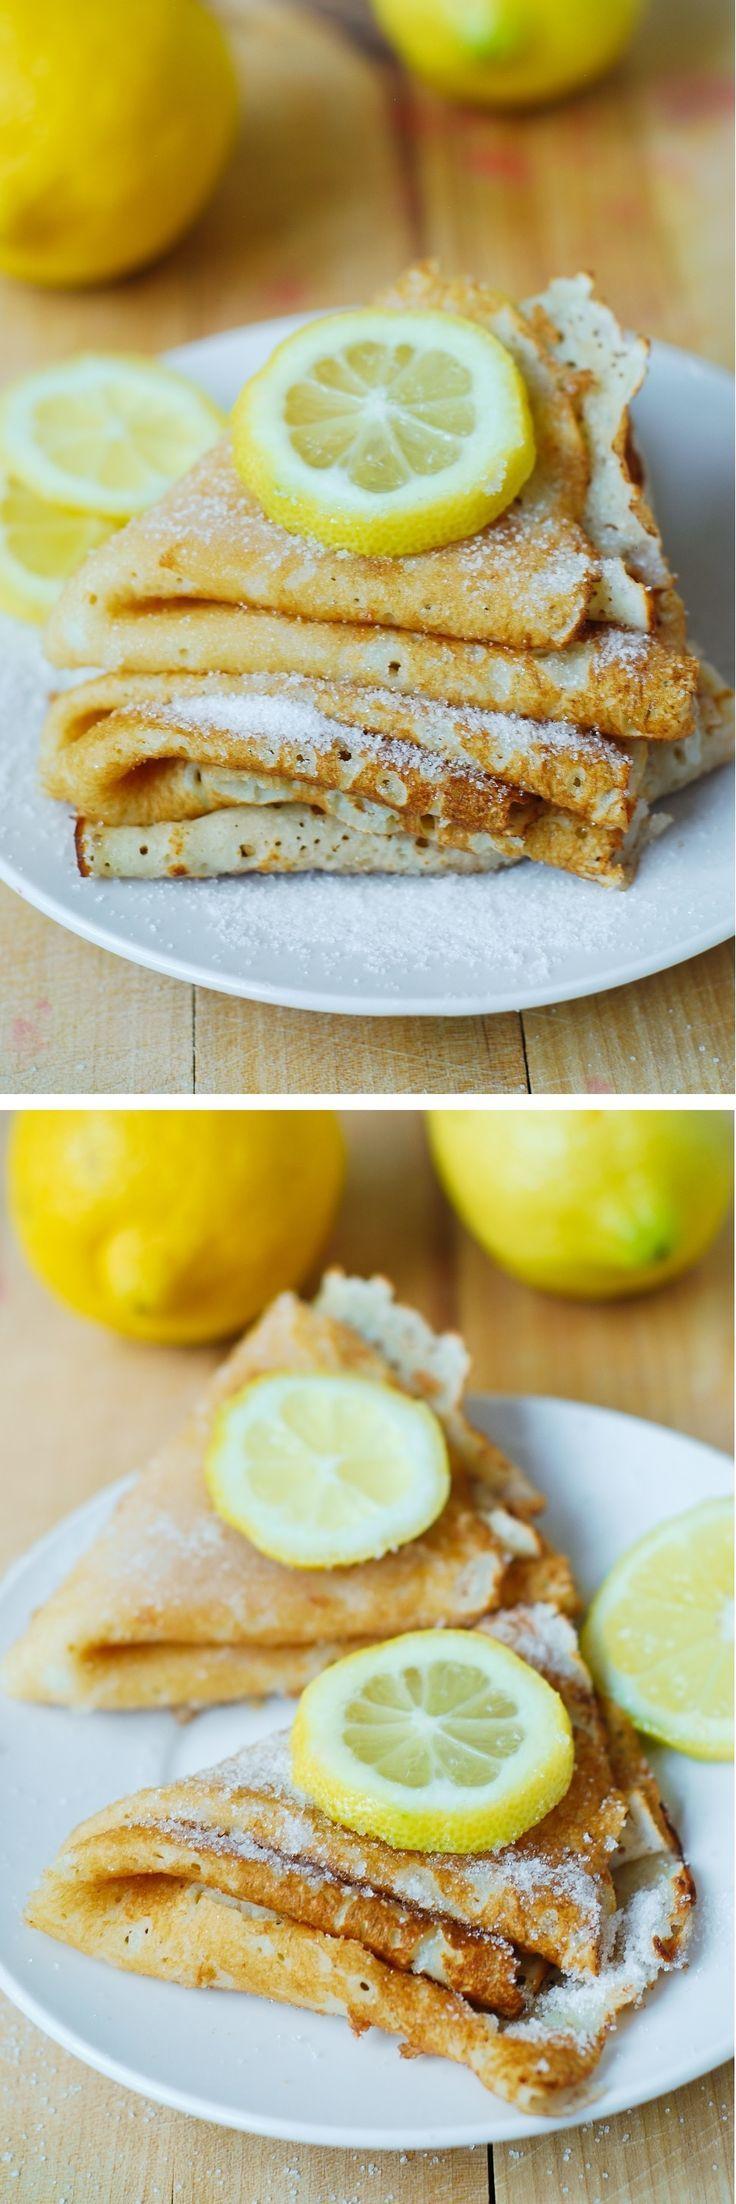 Lemon Sugar Dessert Crepes - easy-to-make and so delicious!